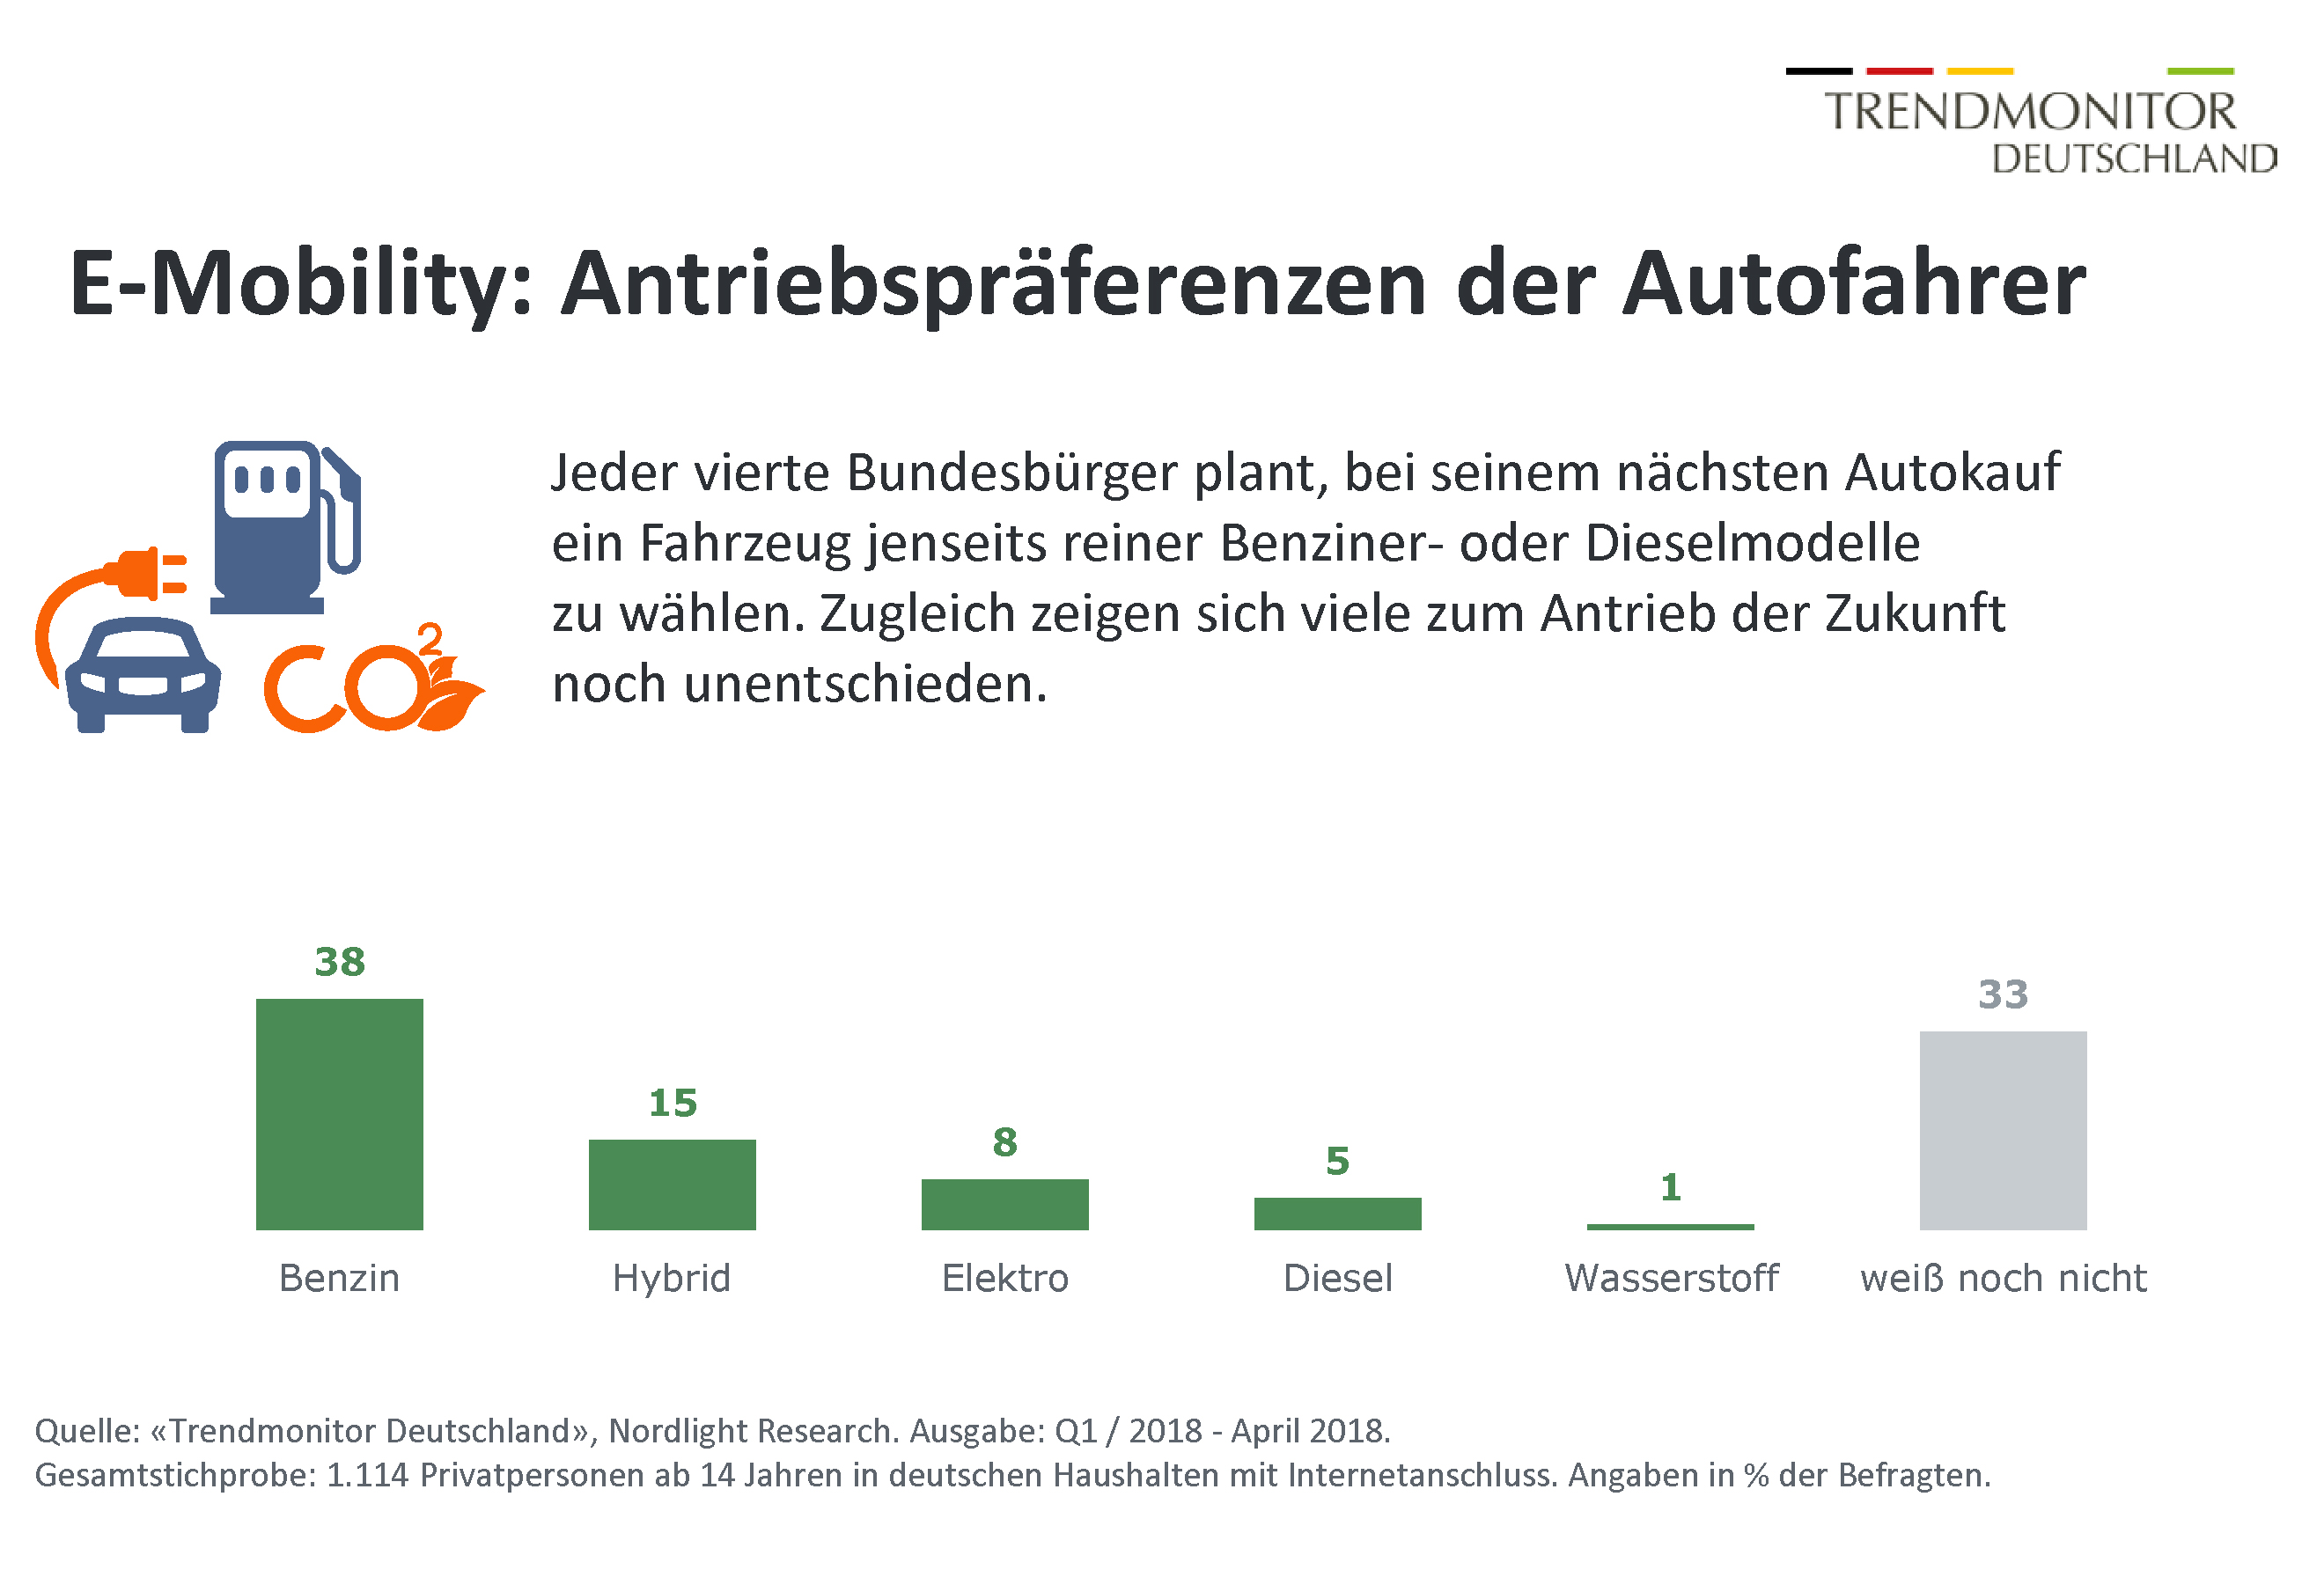 Trendmonitor-Deutschland-E-Mobilitaet-2018